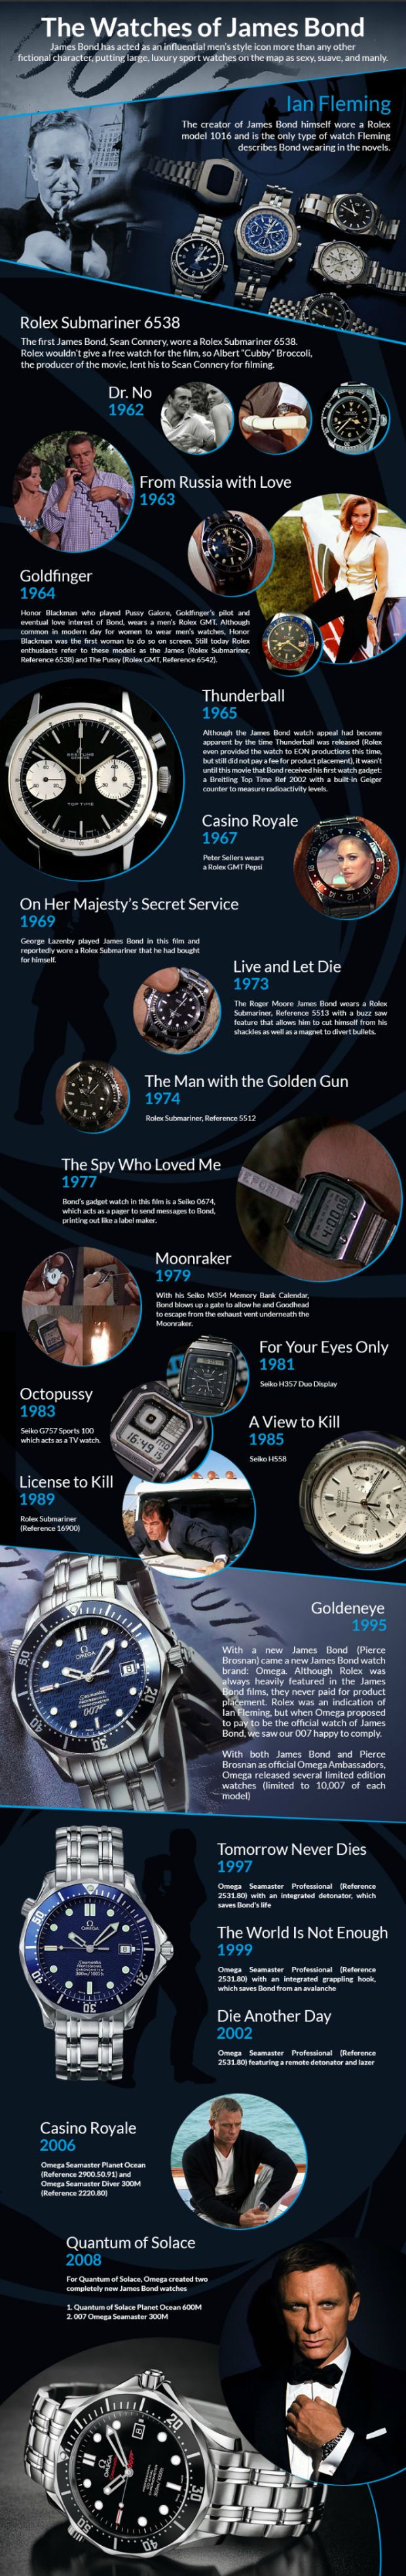 james bond watches infographic